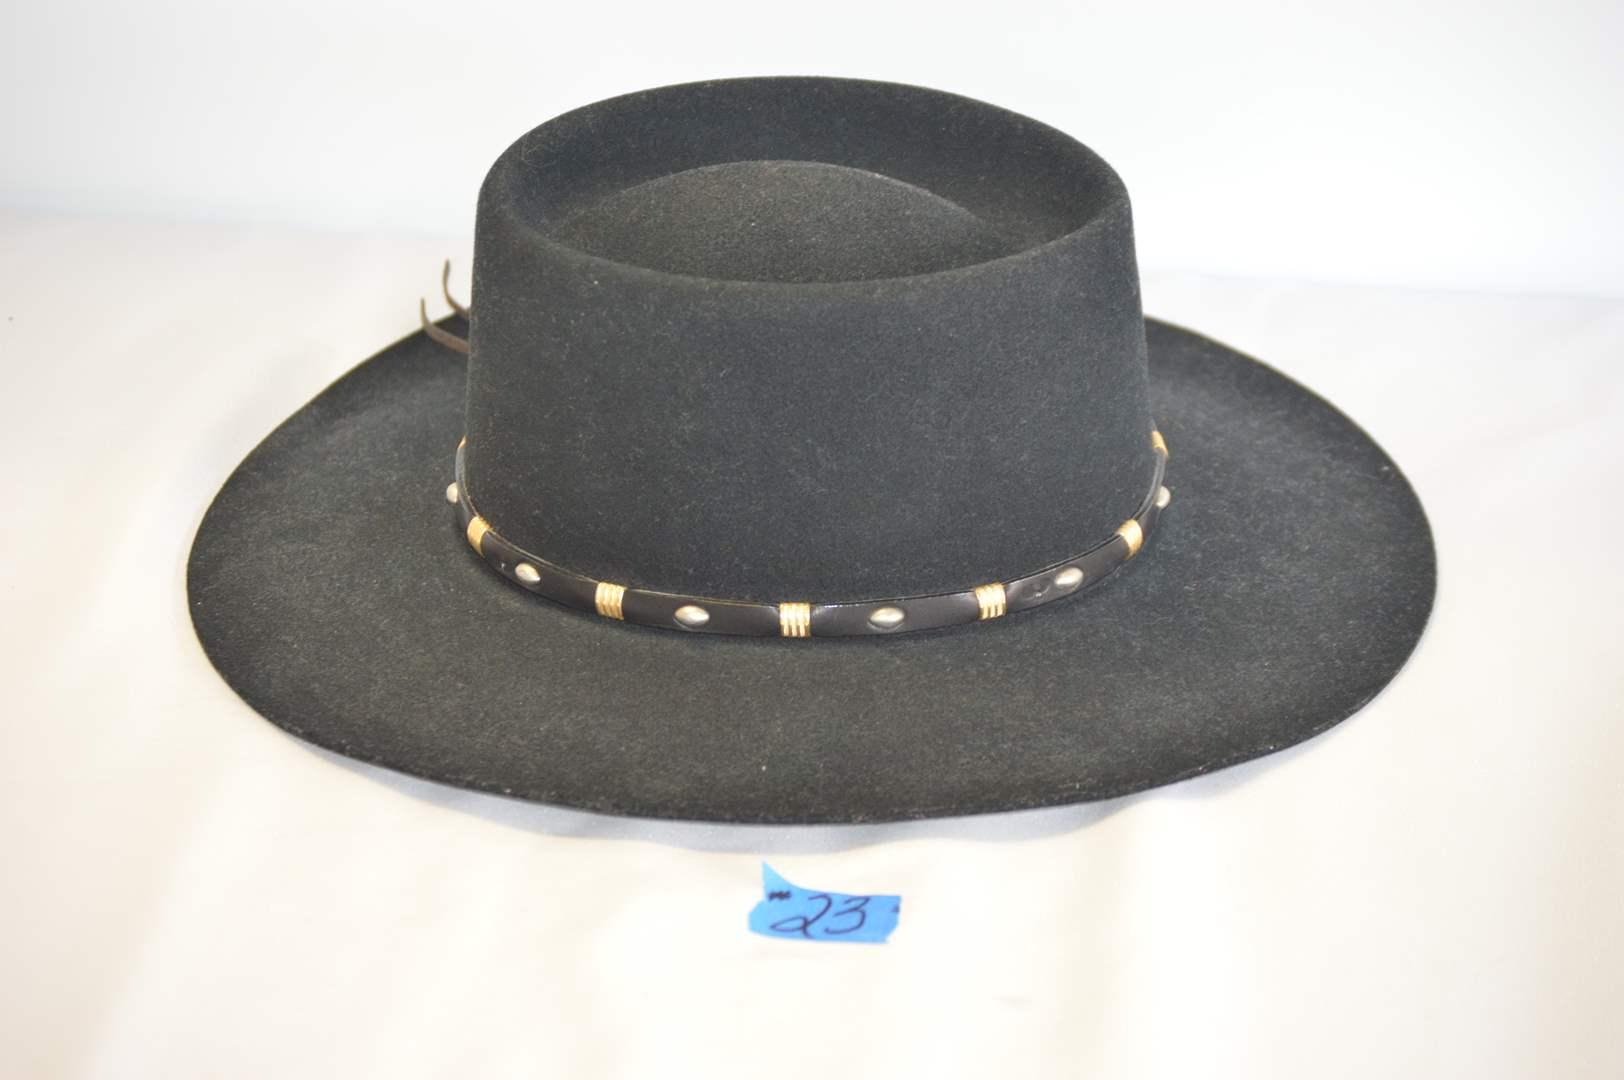 Lot # 23 Renegade XX Fur Blend cowboy hat - Size 6 7/8 (main image)